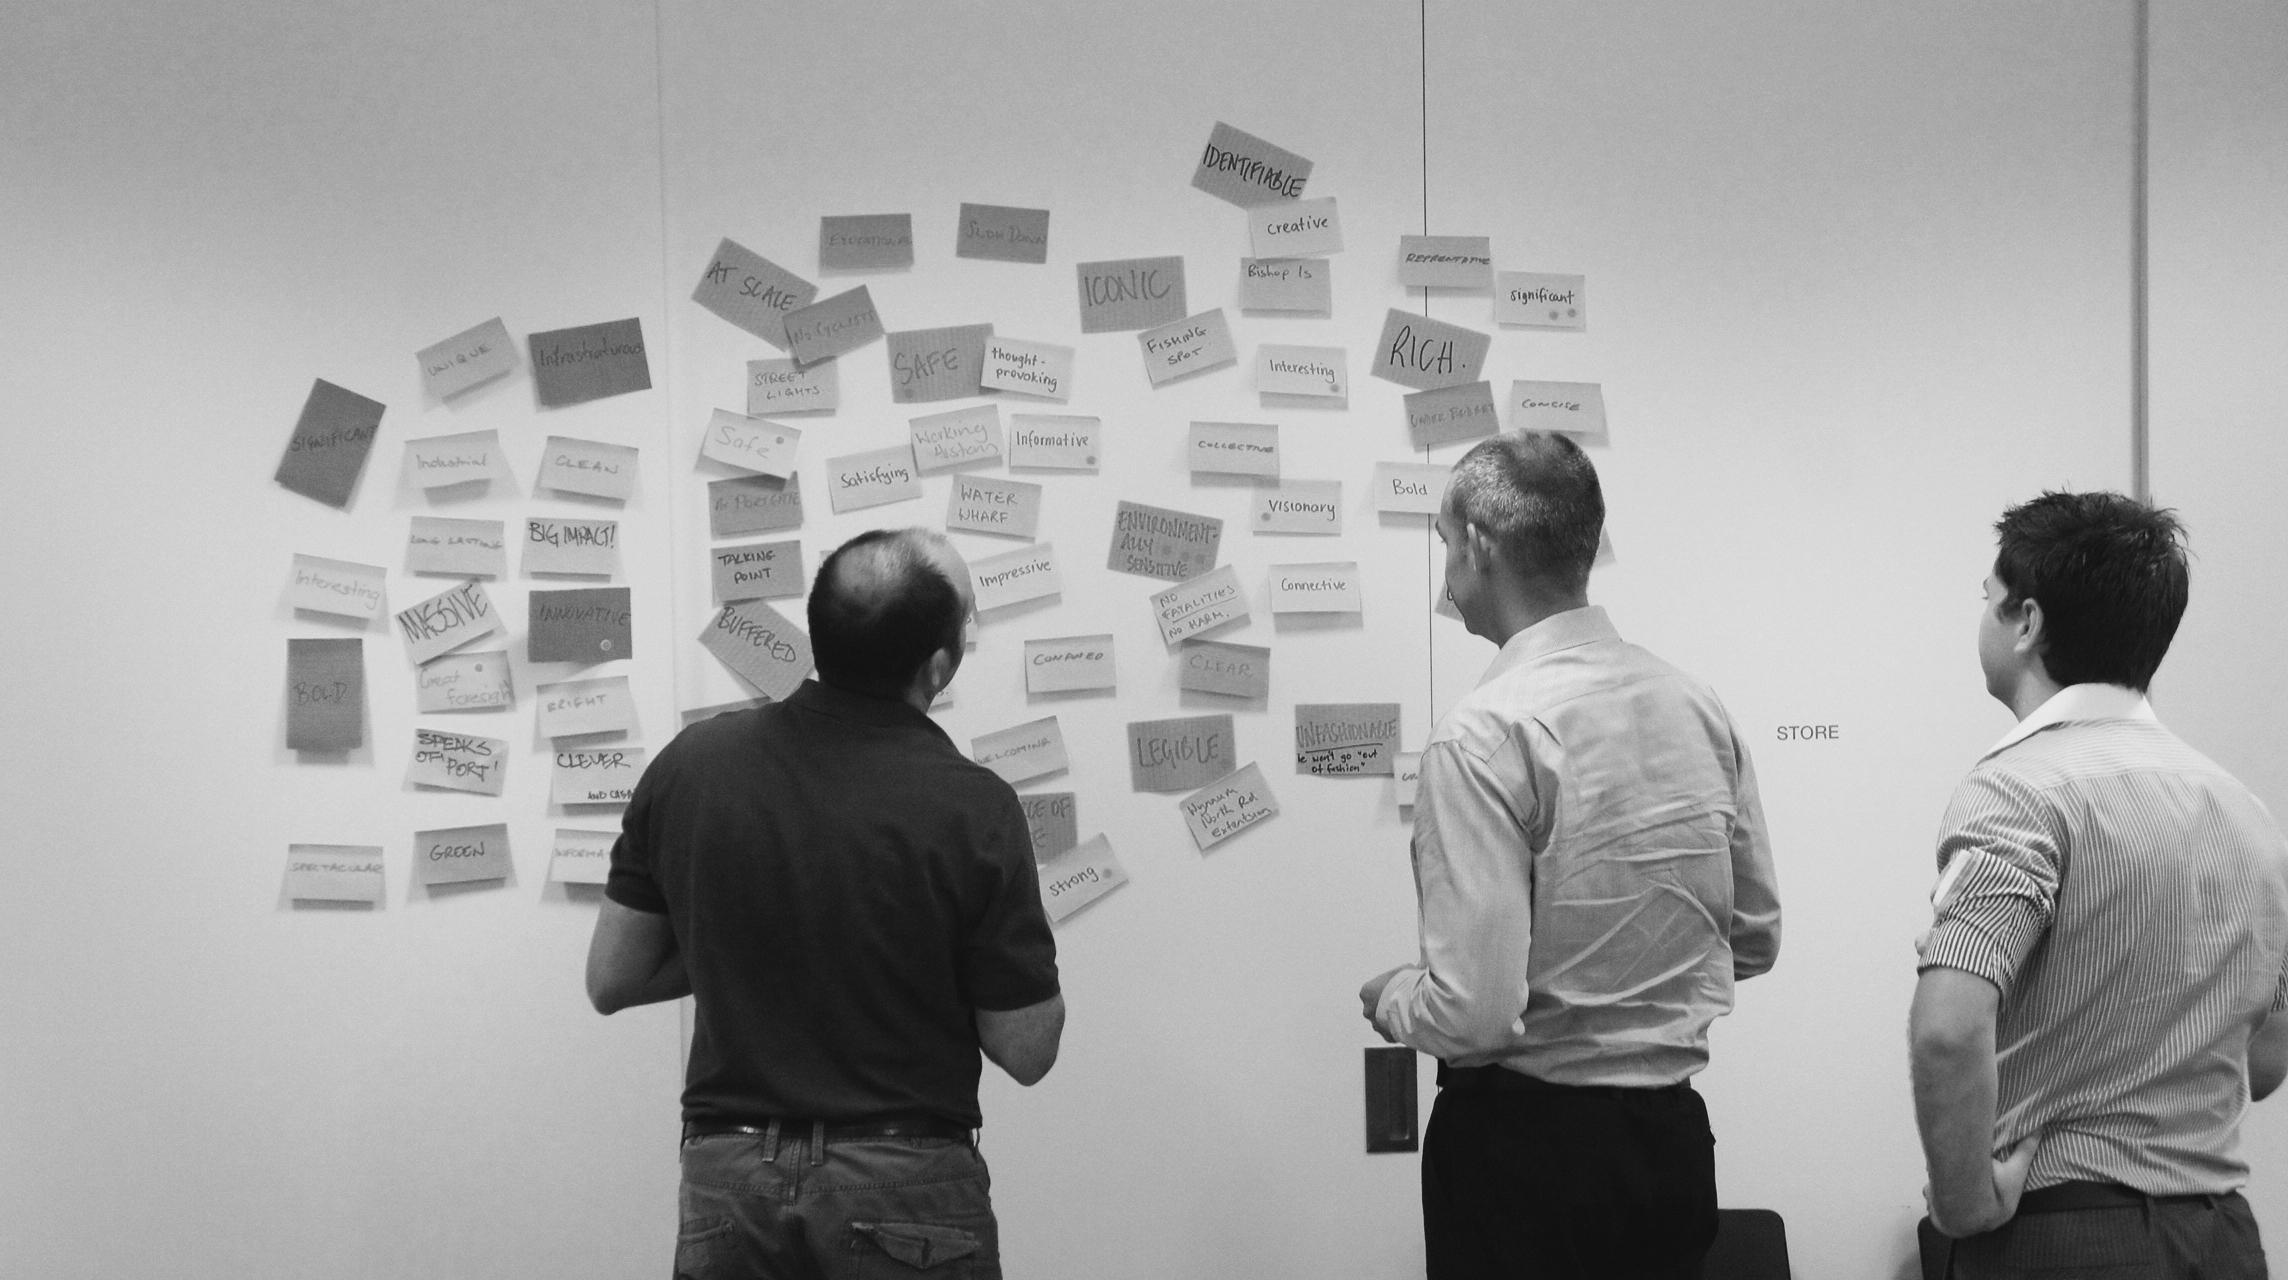 Port of Brisbane Issues Workshop, 2013